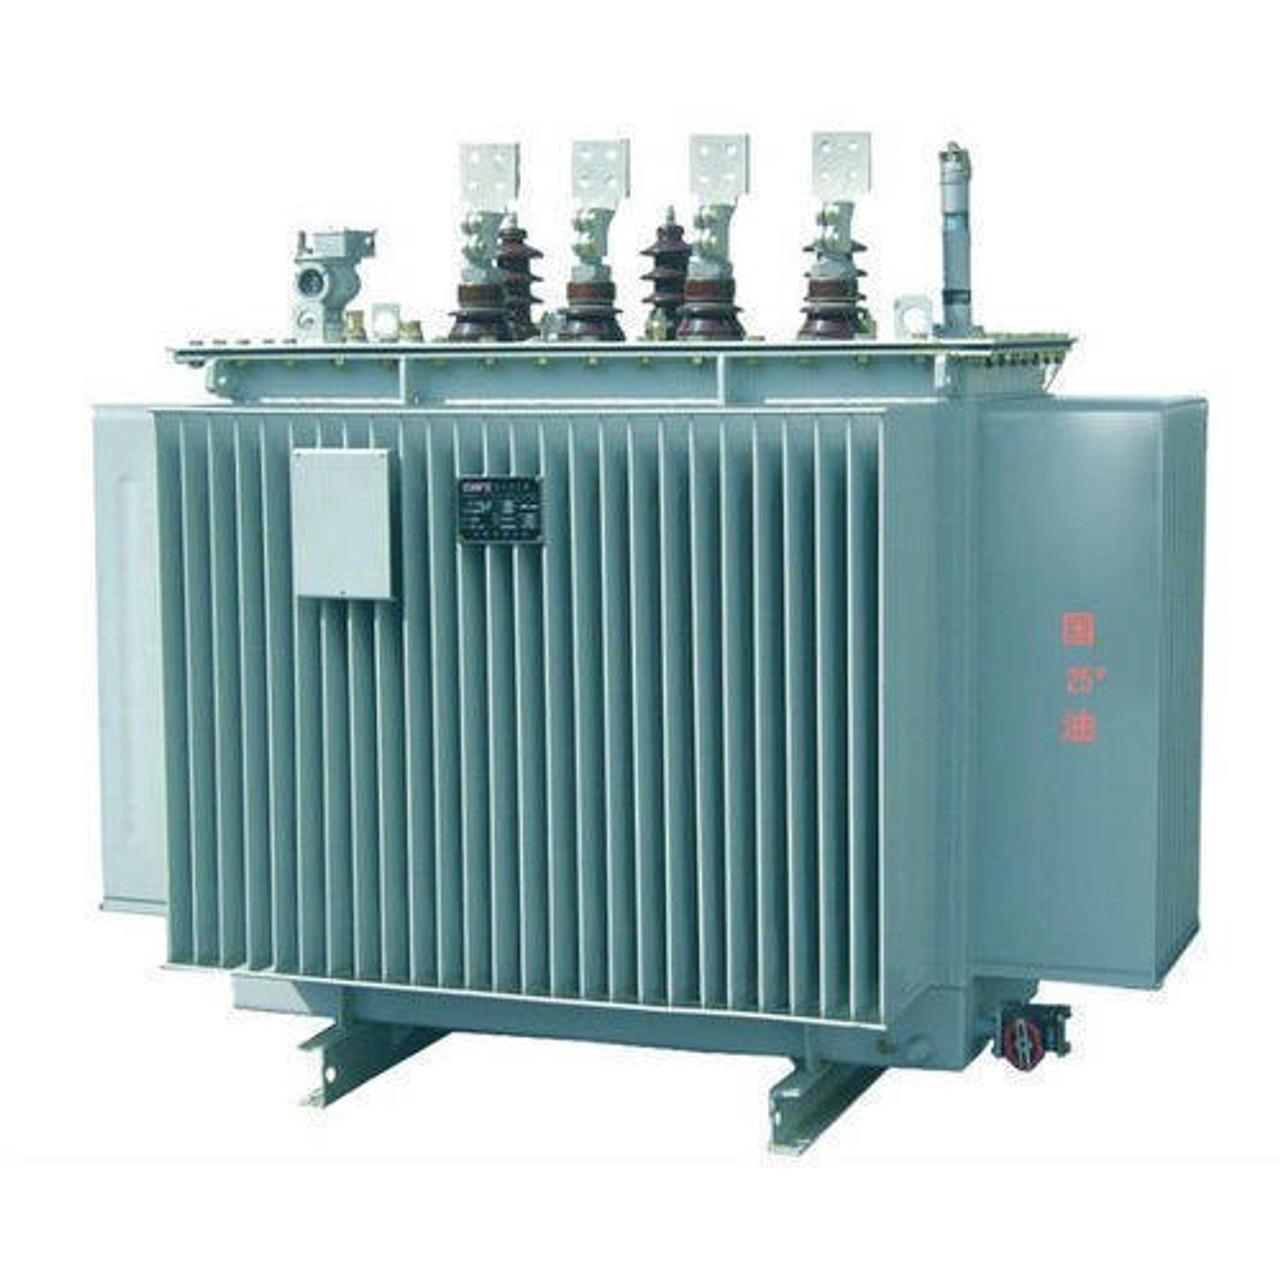 Power Transformer ABB 100KVA 11 0/415KV